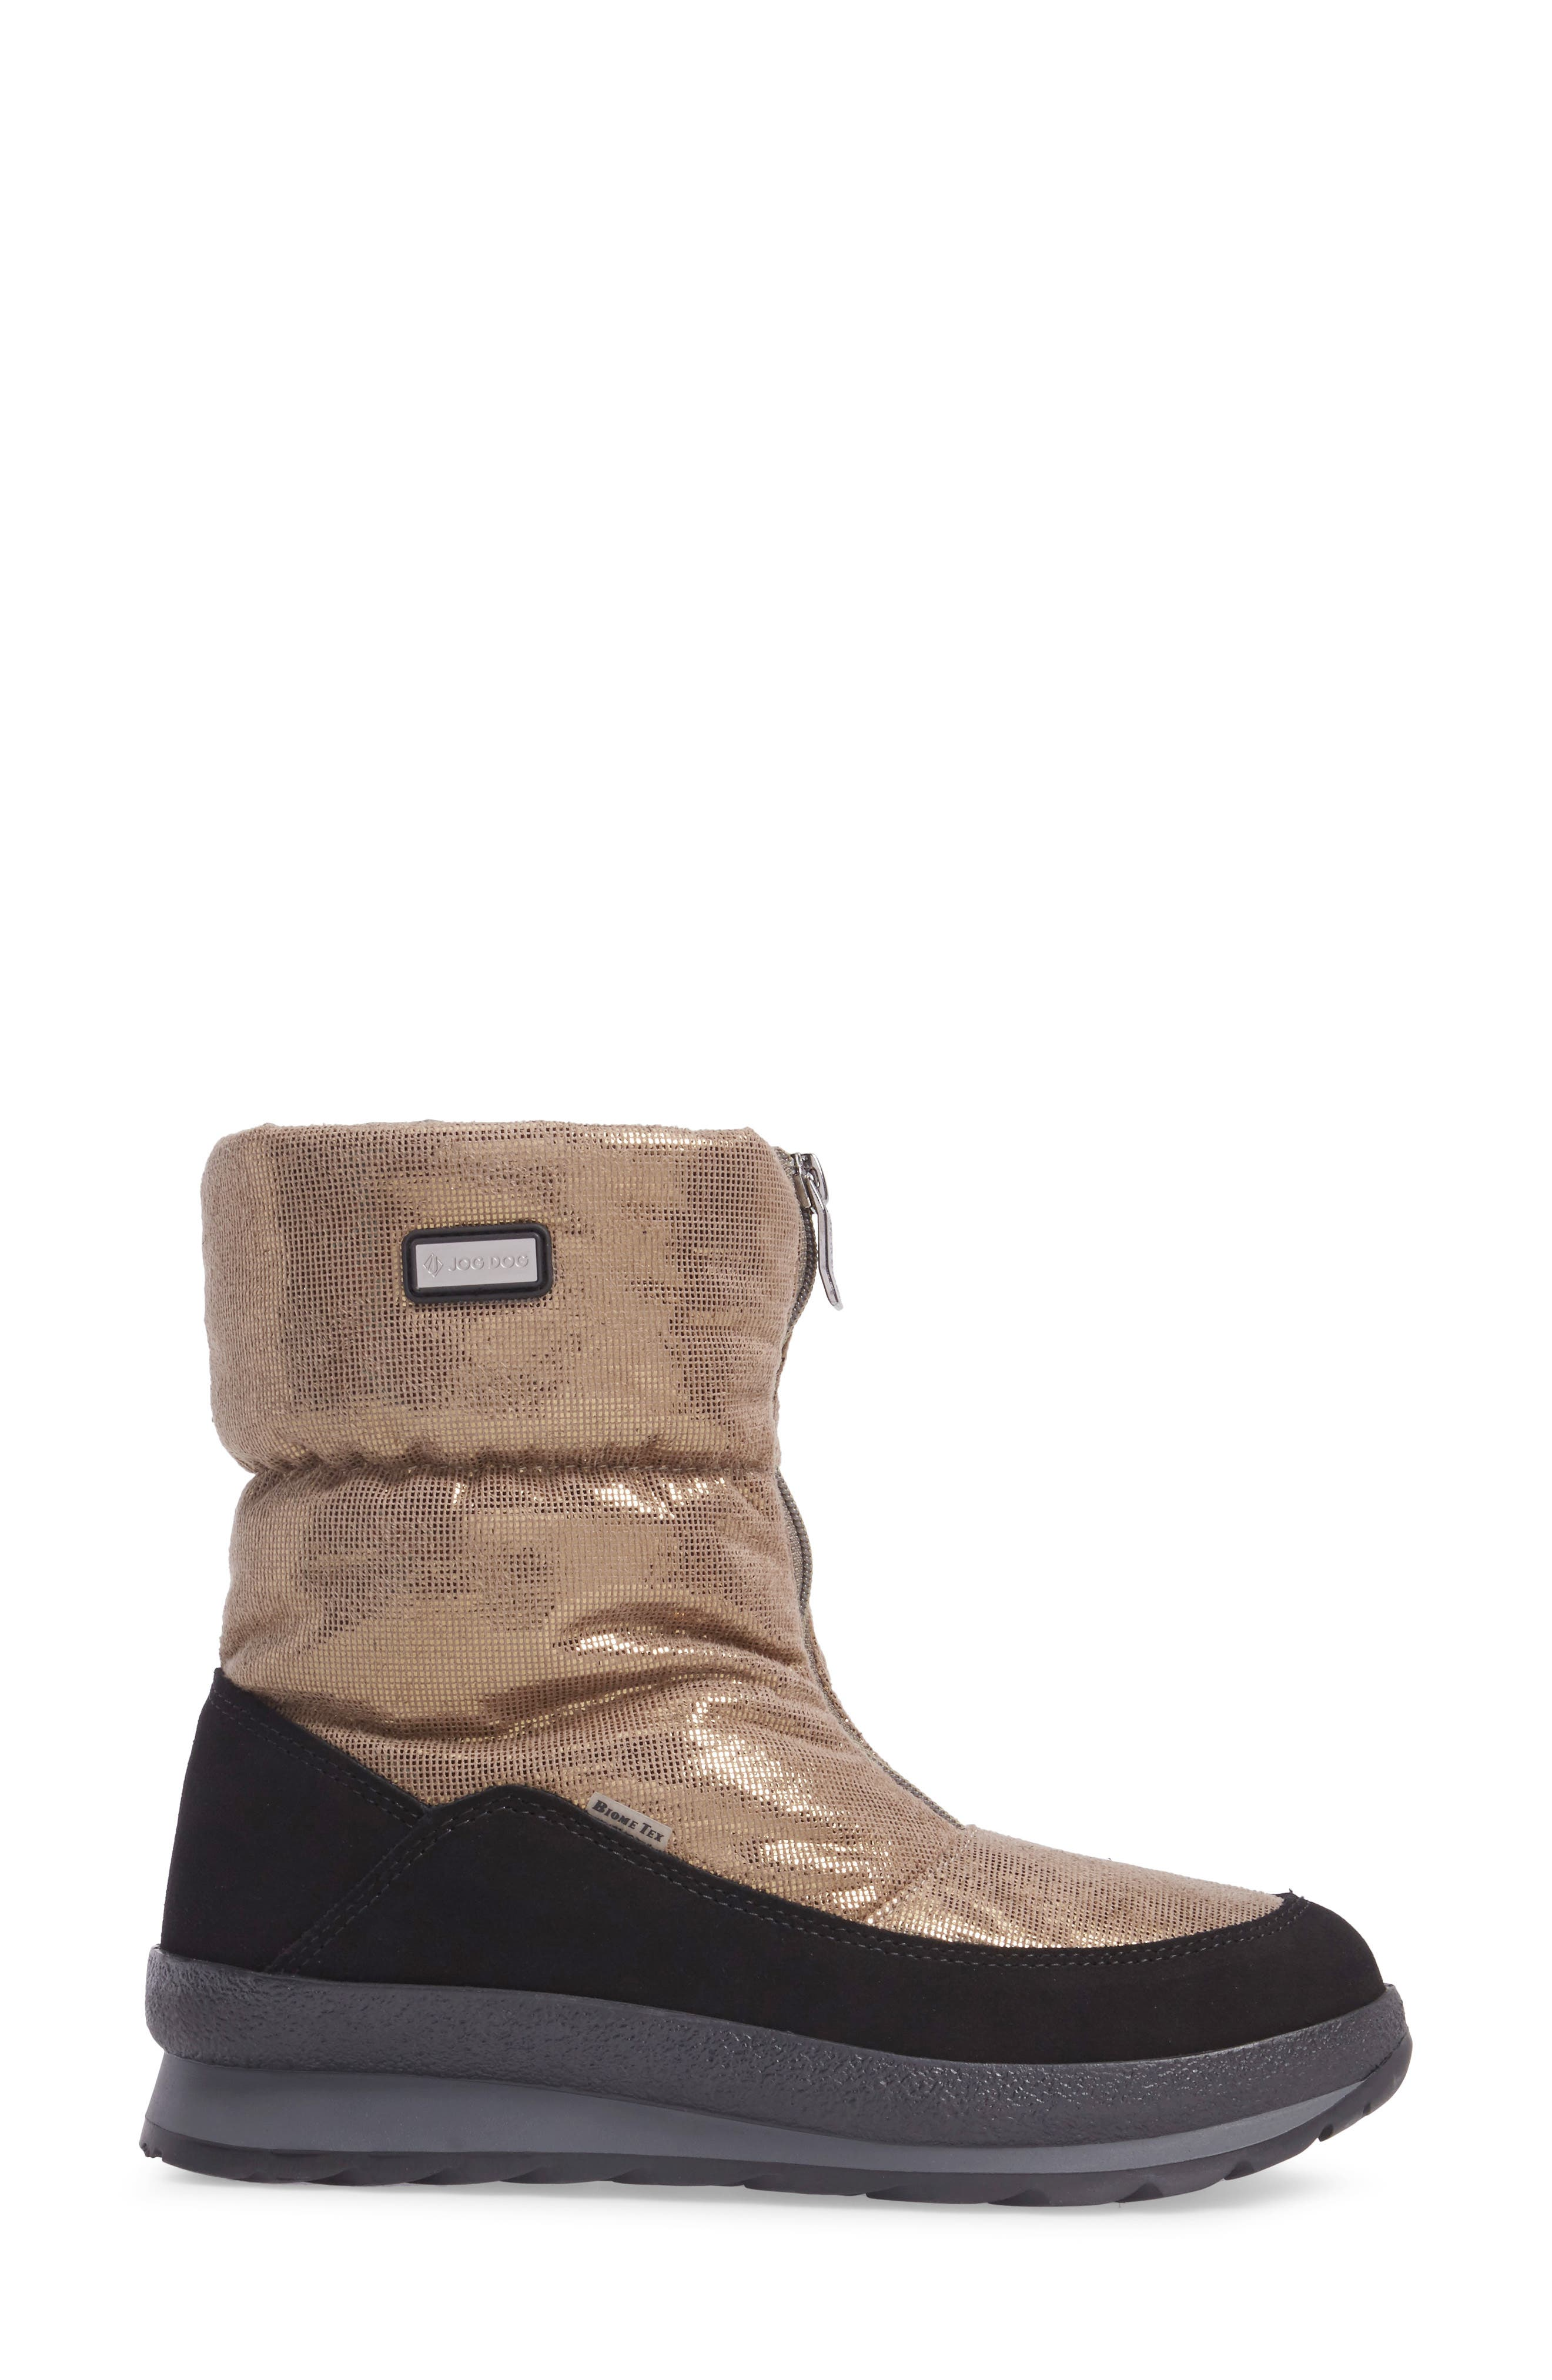 Val Gardena Waterproof Boot,                             Alternate thumbnail 8, color,